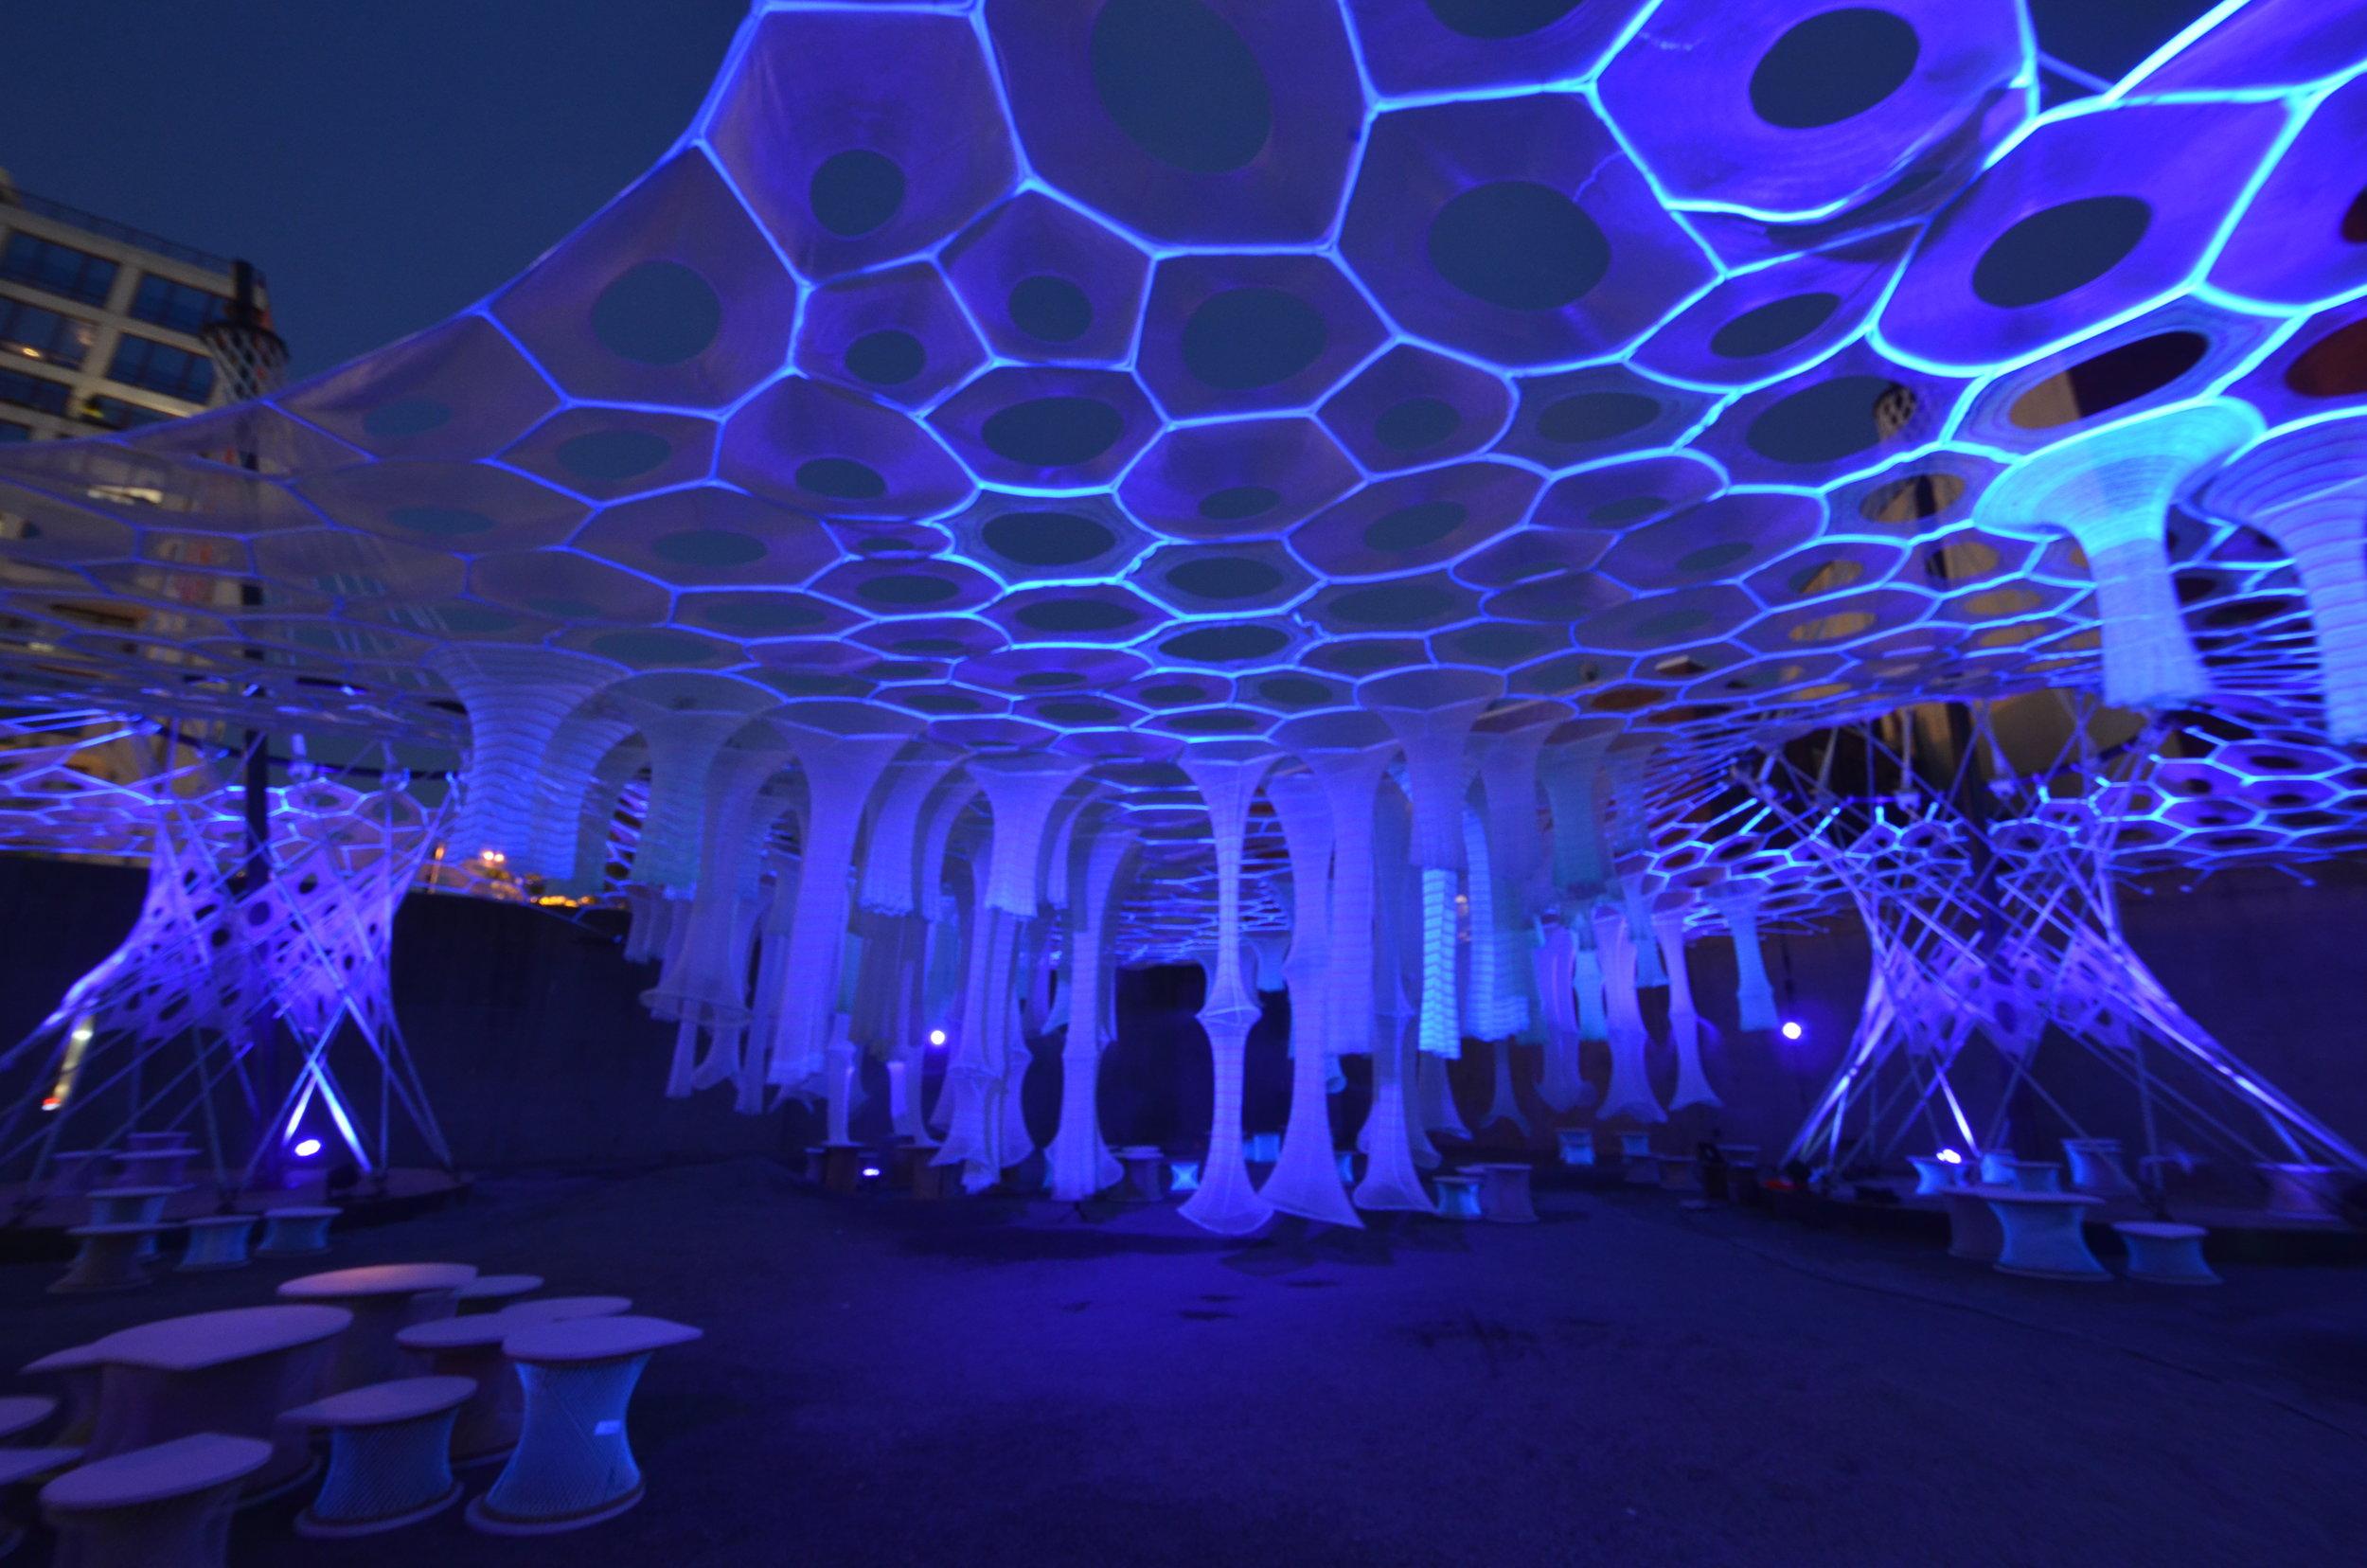 News Focus Lighting Architectural Lighting Design